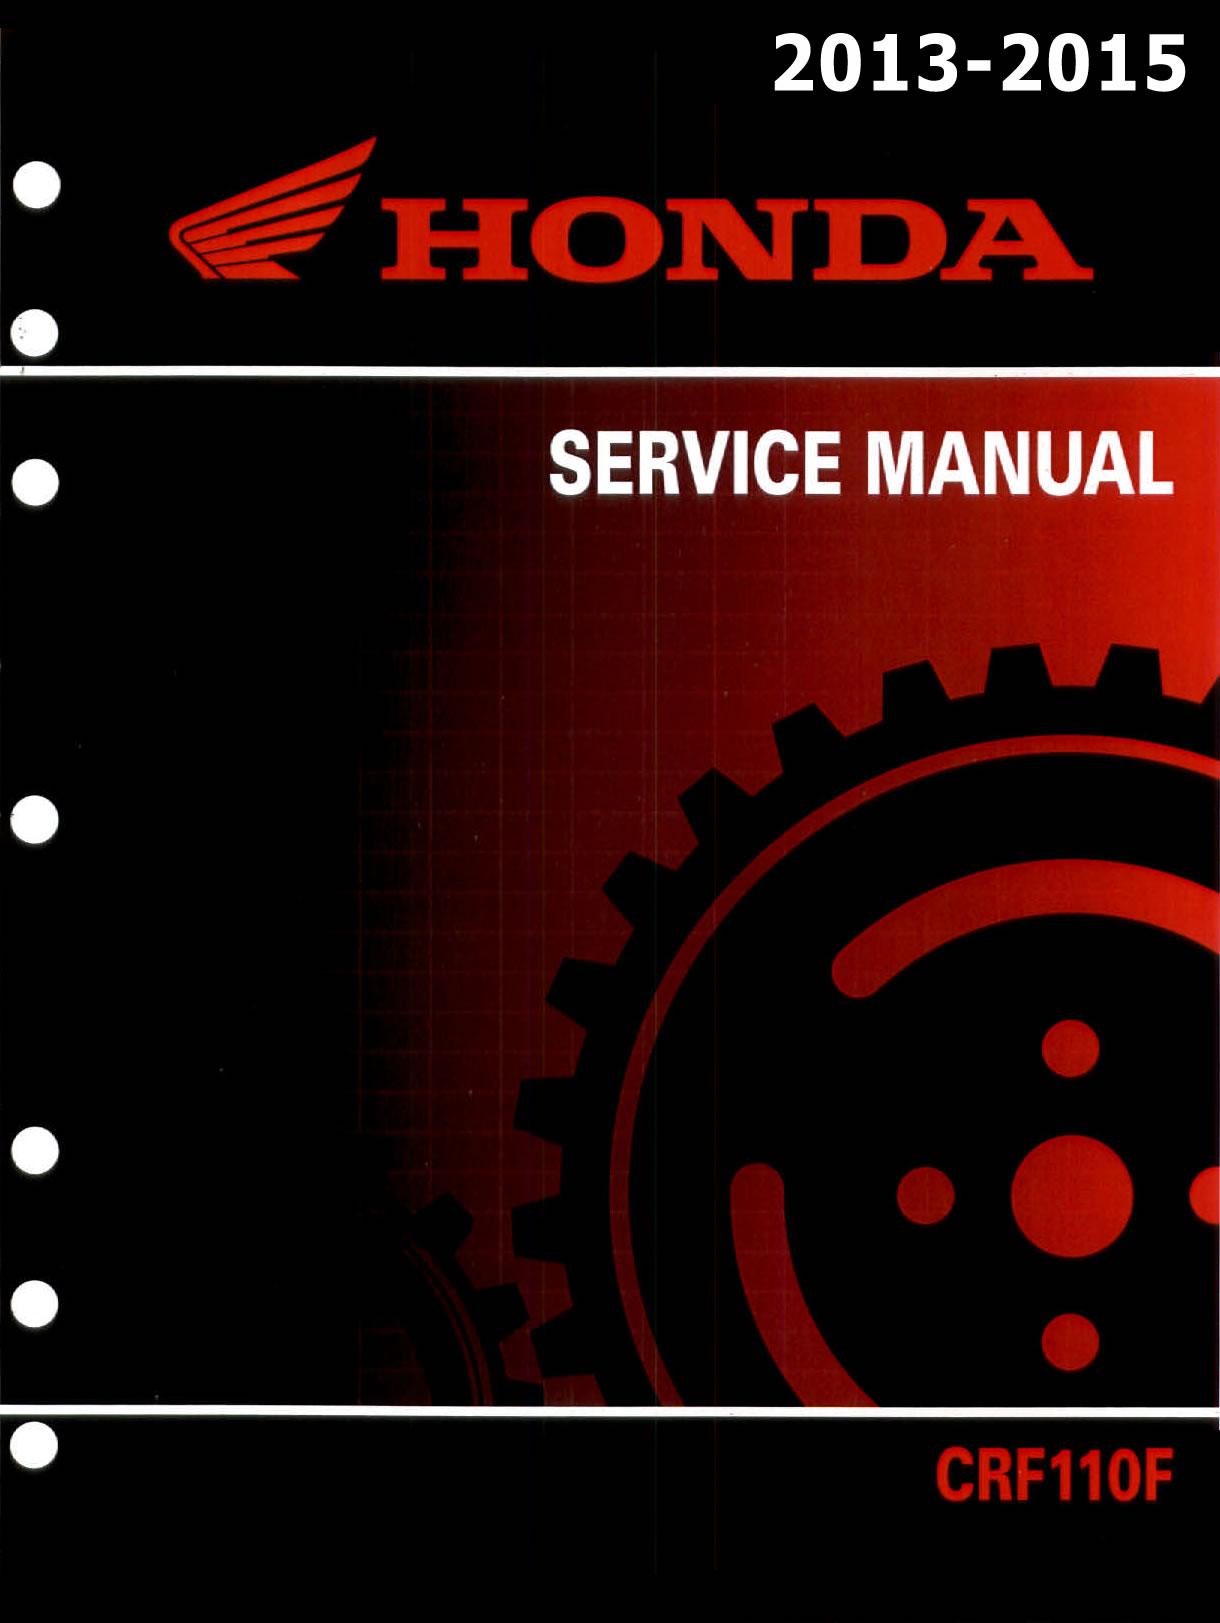 Workshop Manual for Honda CRF110F (2013-2015)